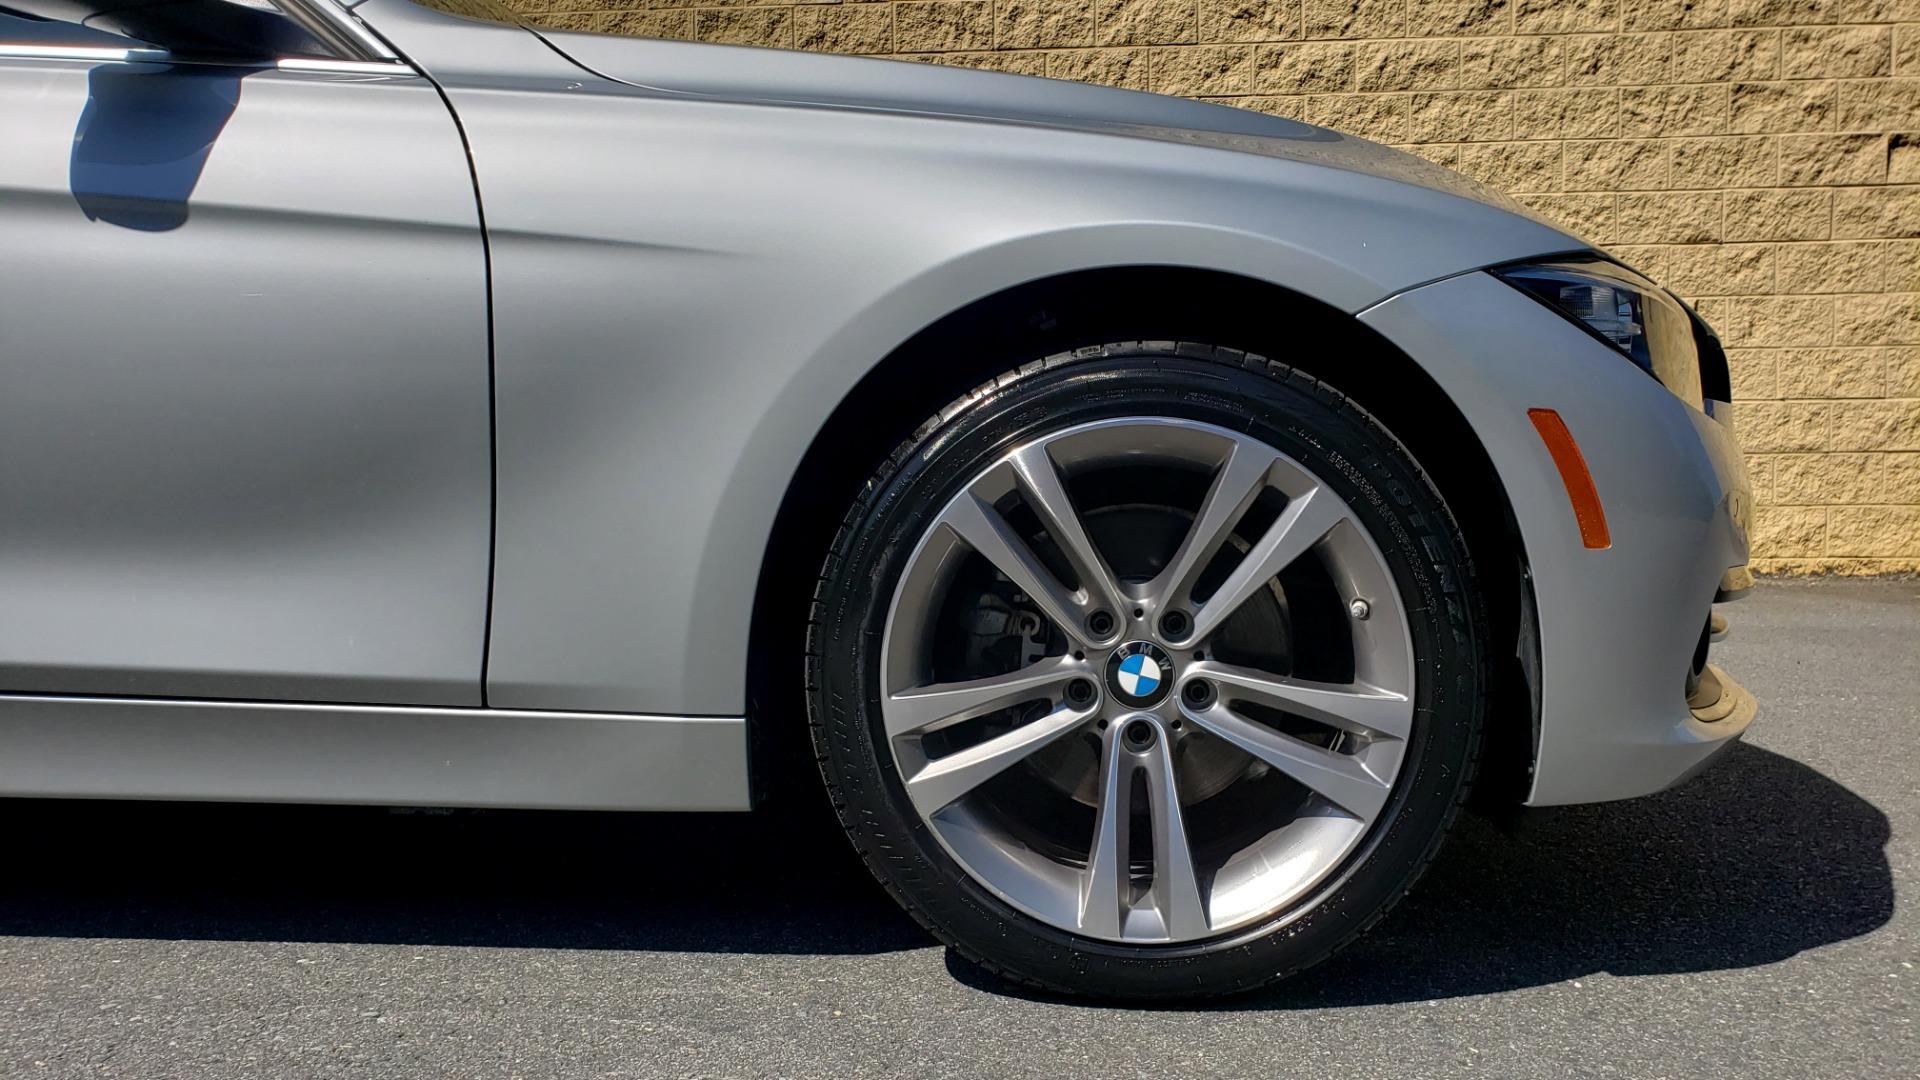 Used 2017 BMW 3 SERIES 330I SPORT SEDAN / DRVR ASST PKG / SUNROOF / REARVIEW for sale Sold at Formula Imports in Charlotte NC 28227 79